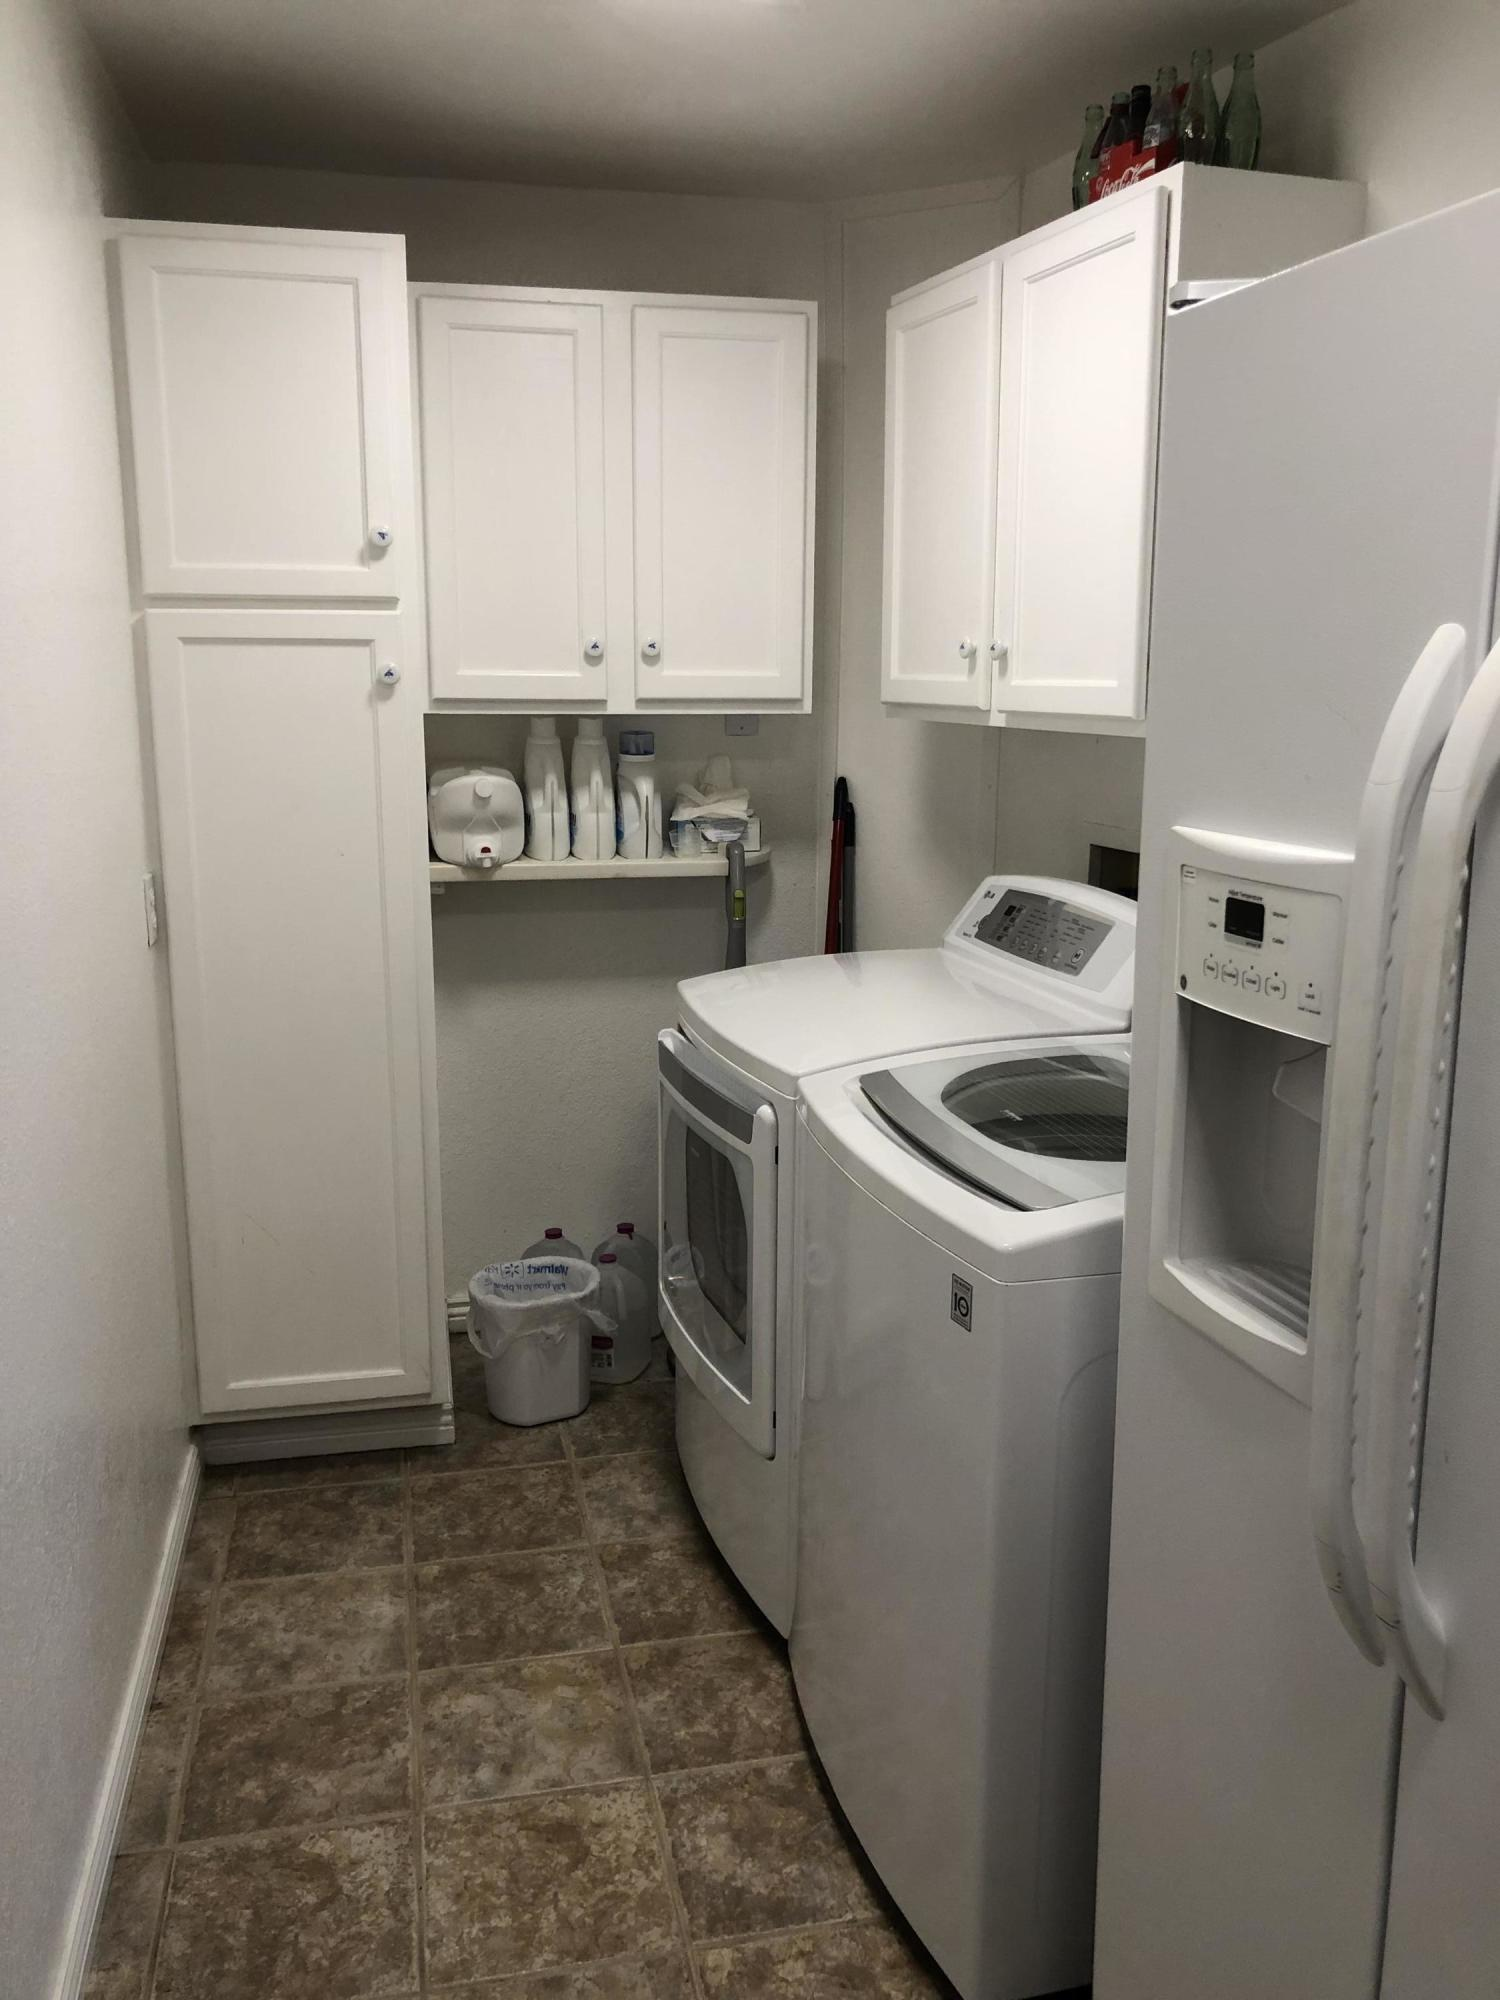 036 Laundry room 1